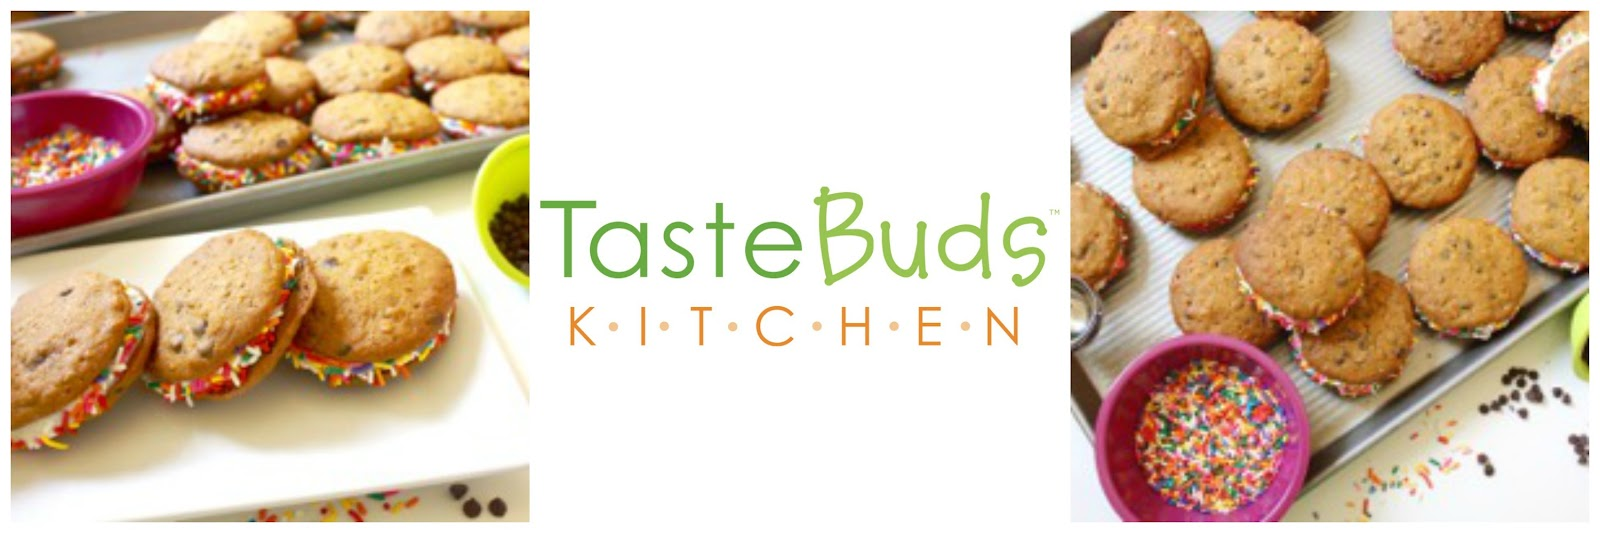 tastebuds2.jpg